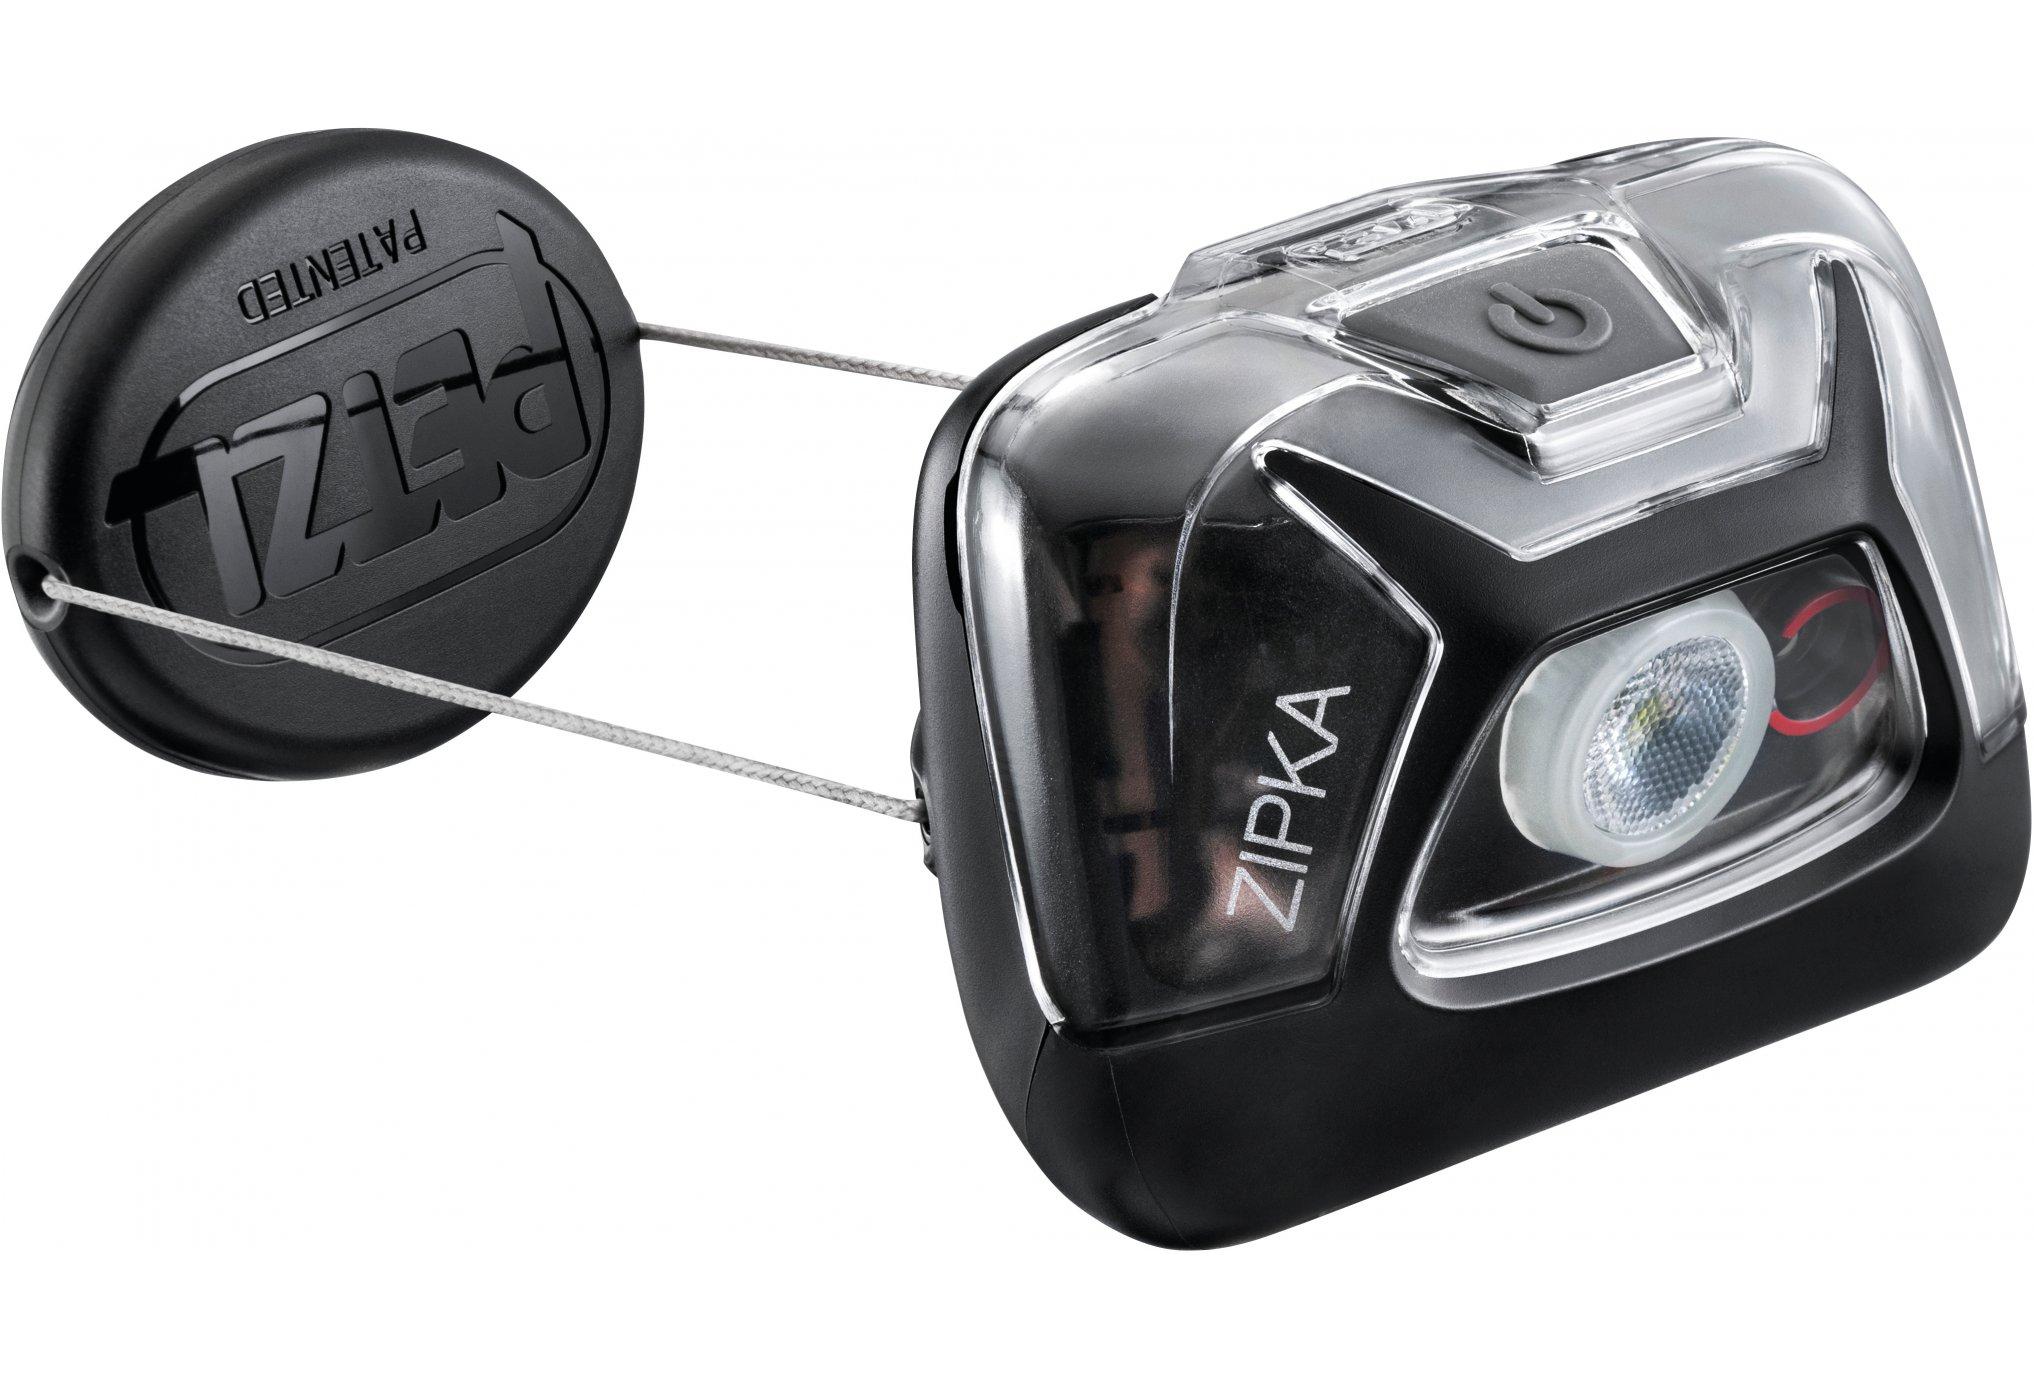 Petzl Zipka - 300 lumens Lampe frontale / éclairage